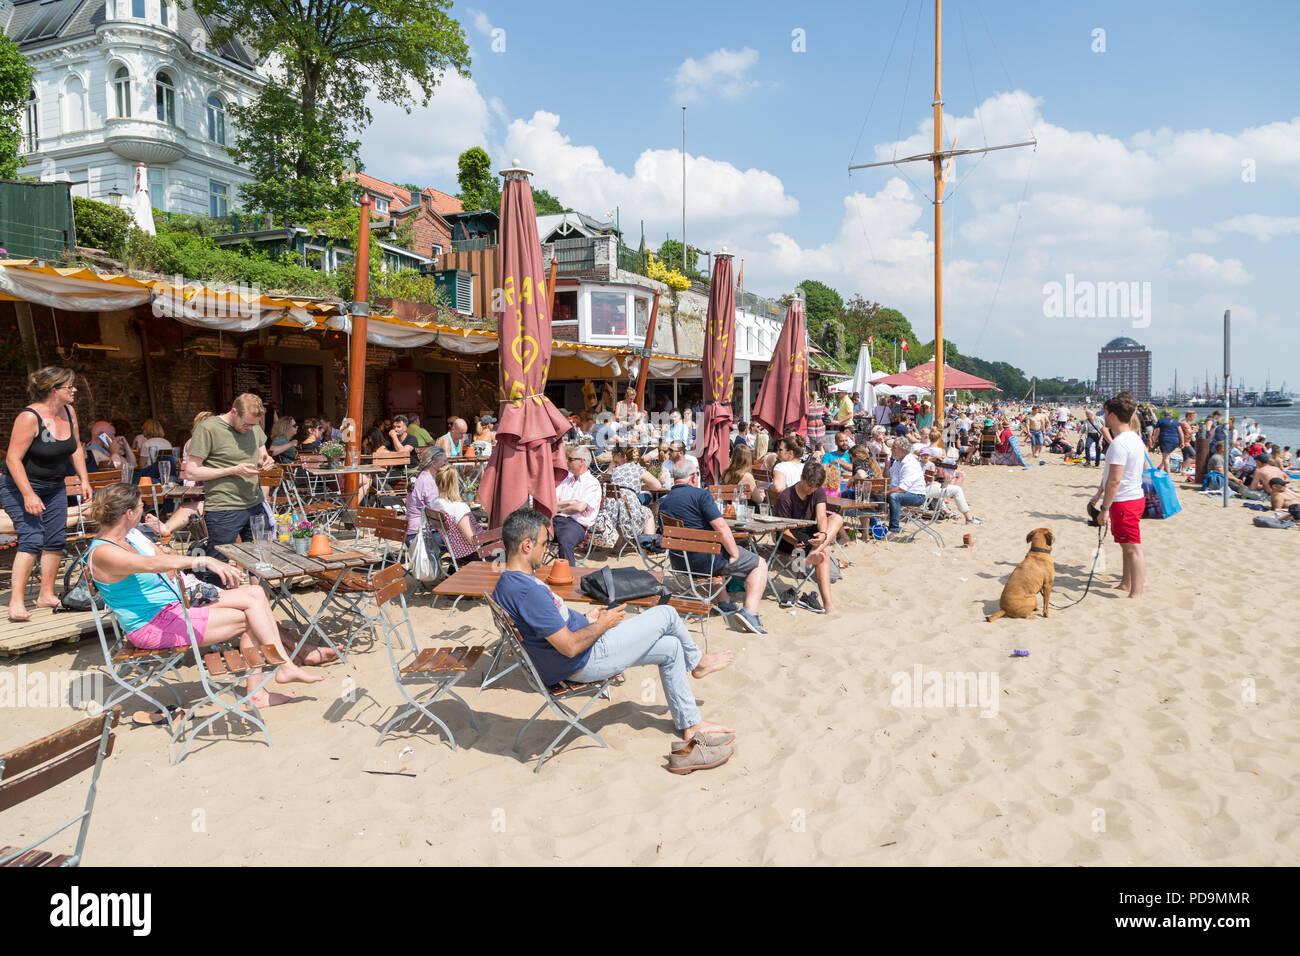 Many people in the restaurant on Elbe beach, beach bar Strandperle, Övelgönne, Elbe, Altona, Hamburg, Germany - Stock Image